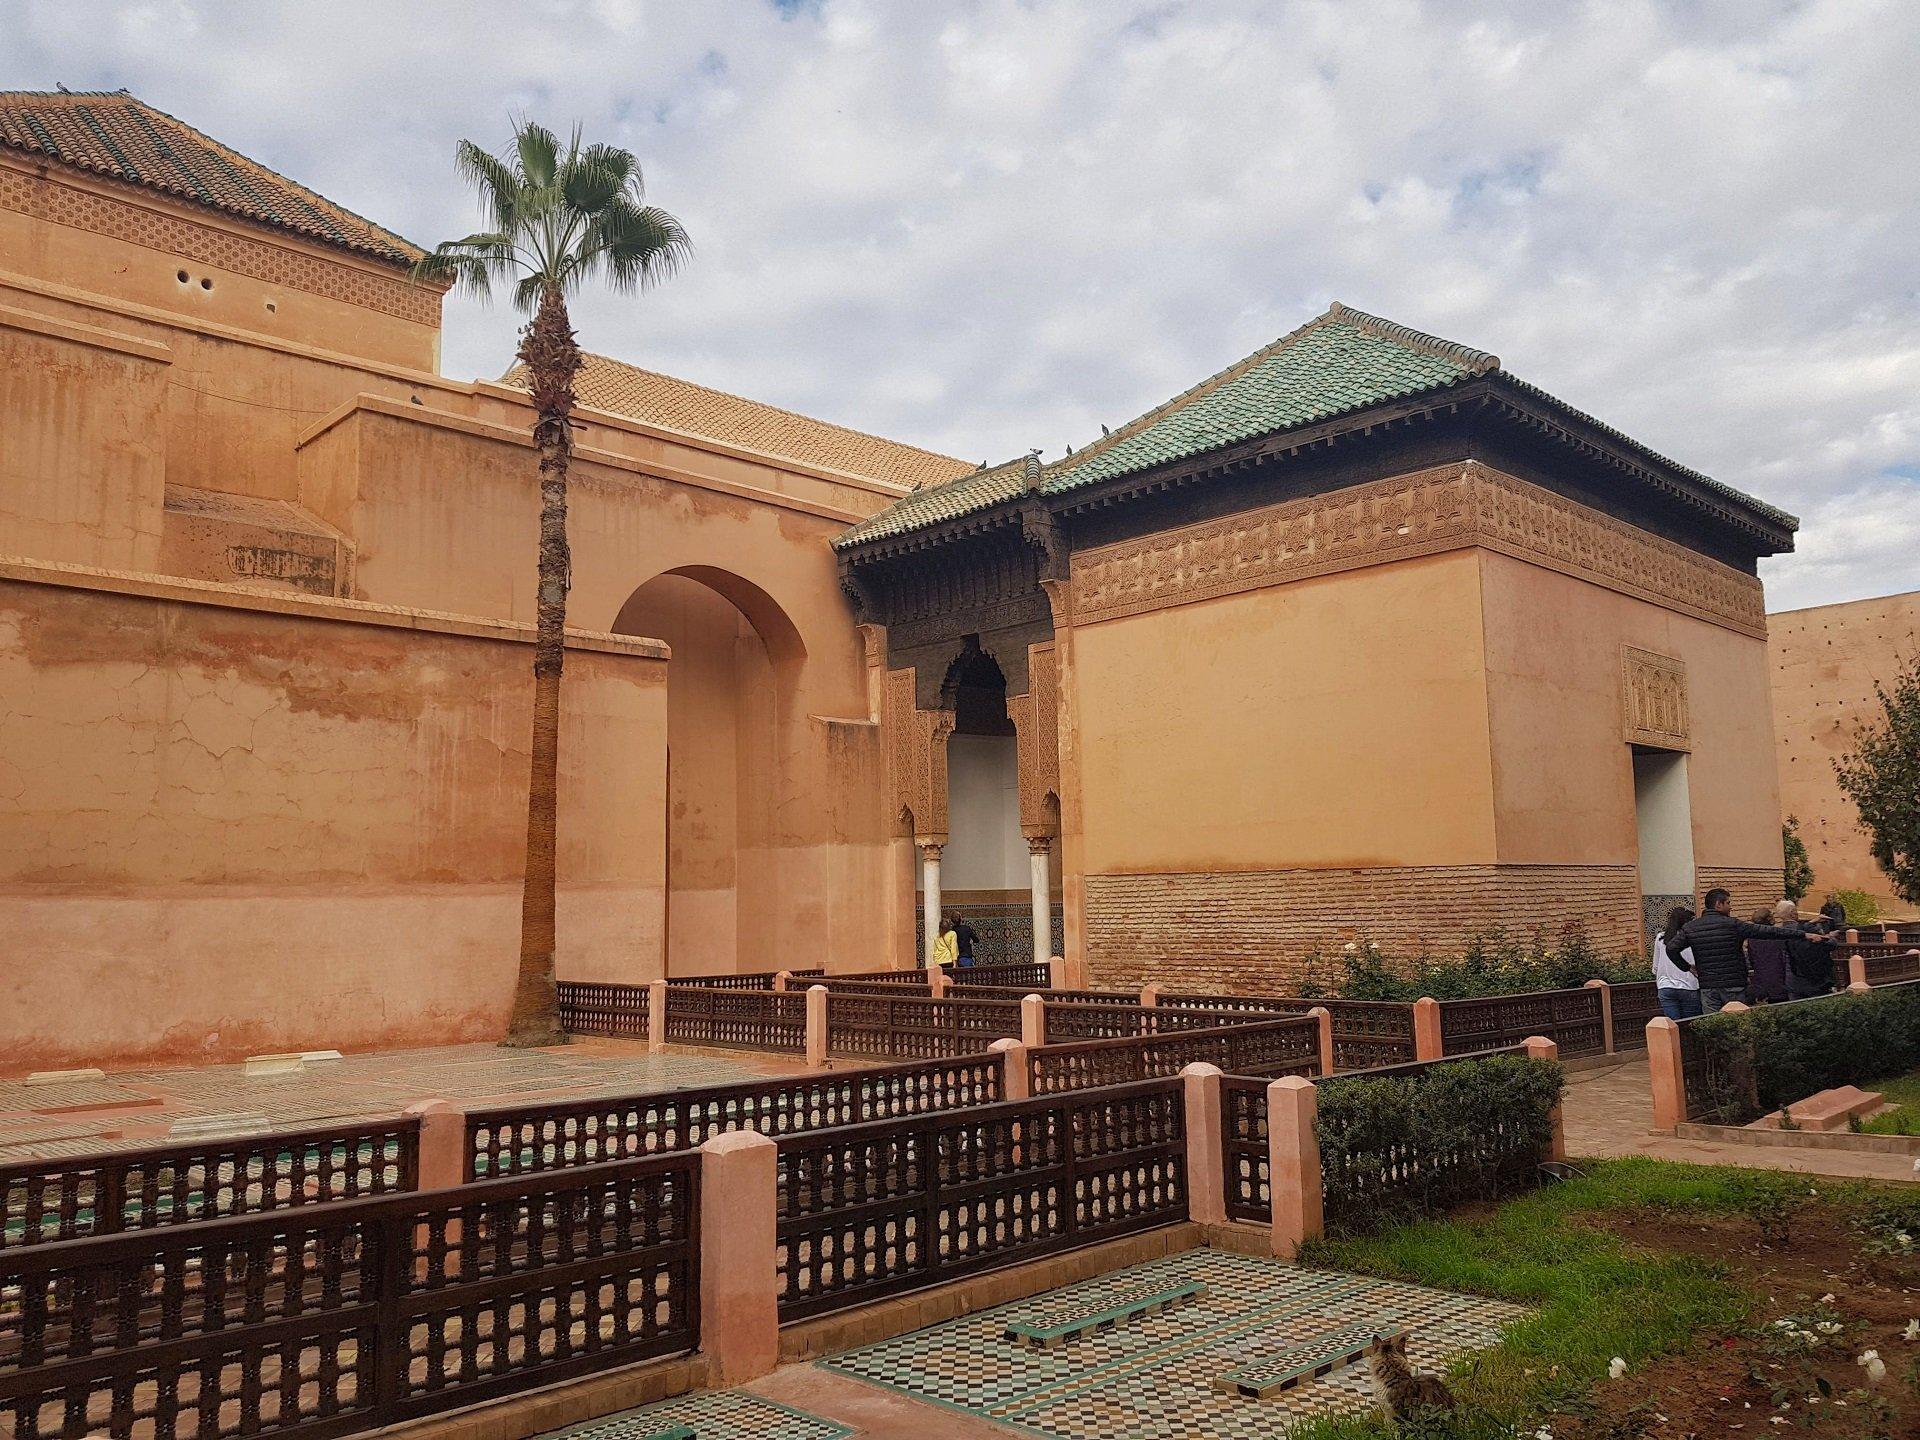 tombe saadiane viaggio in marocco